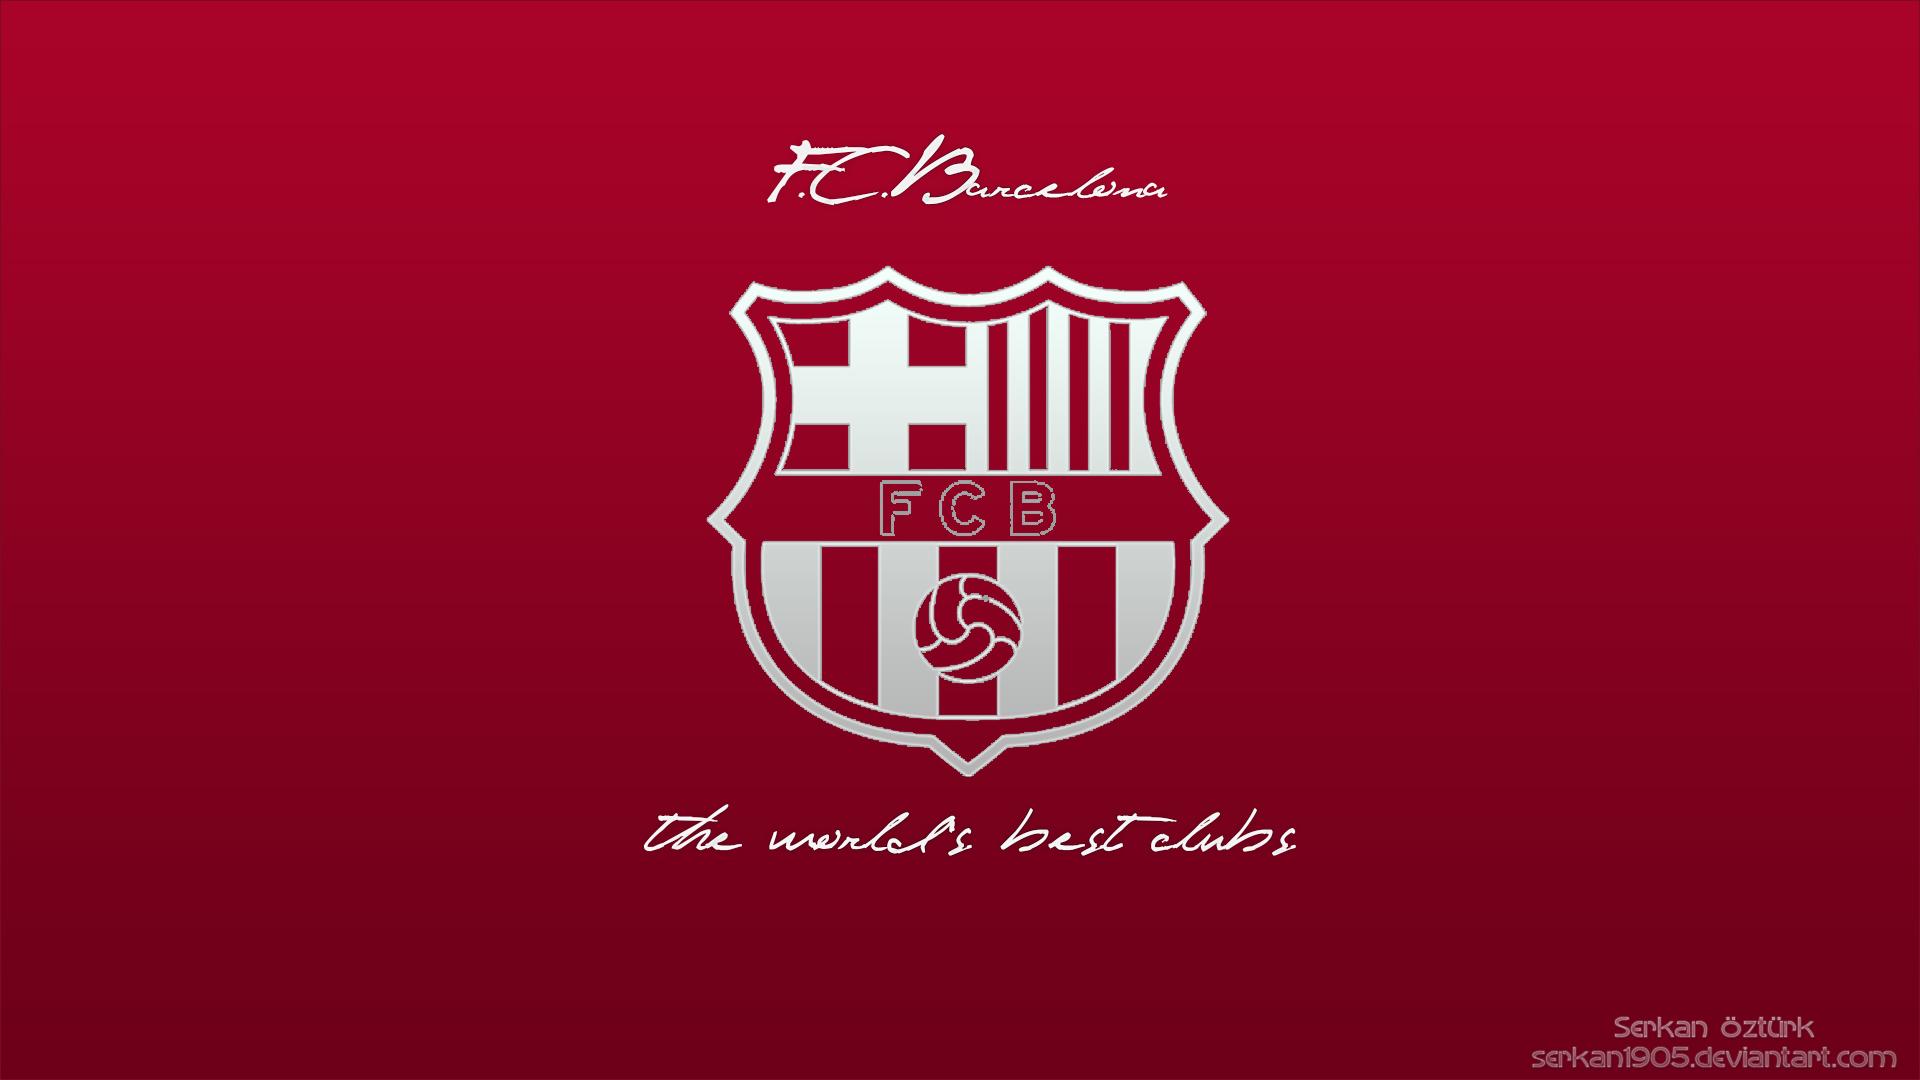 F.C. Barcelona by Serkan1905